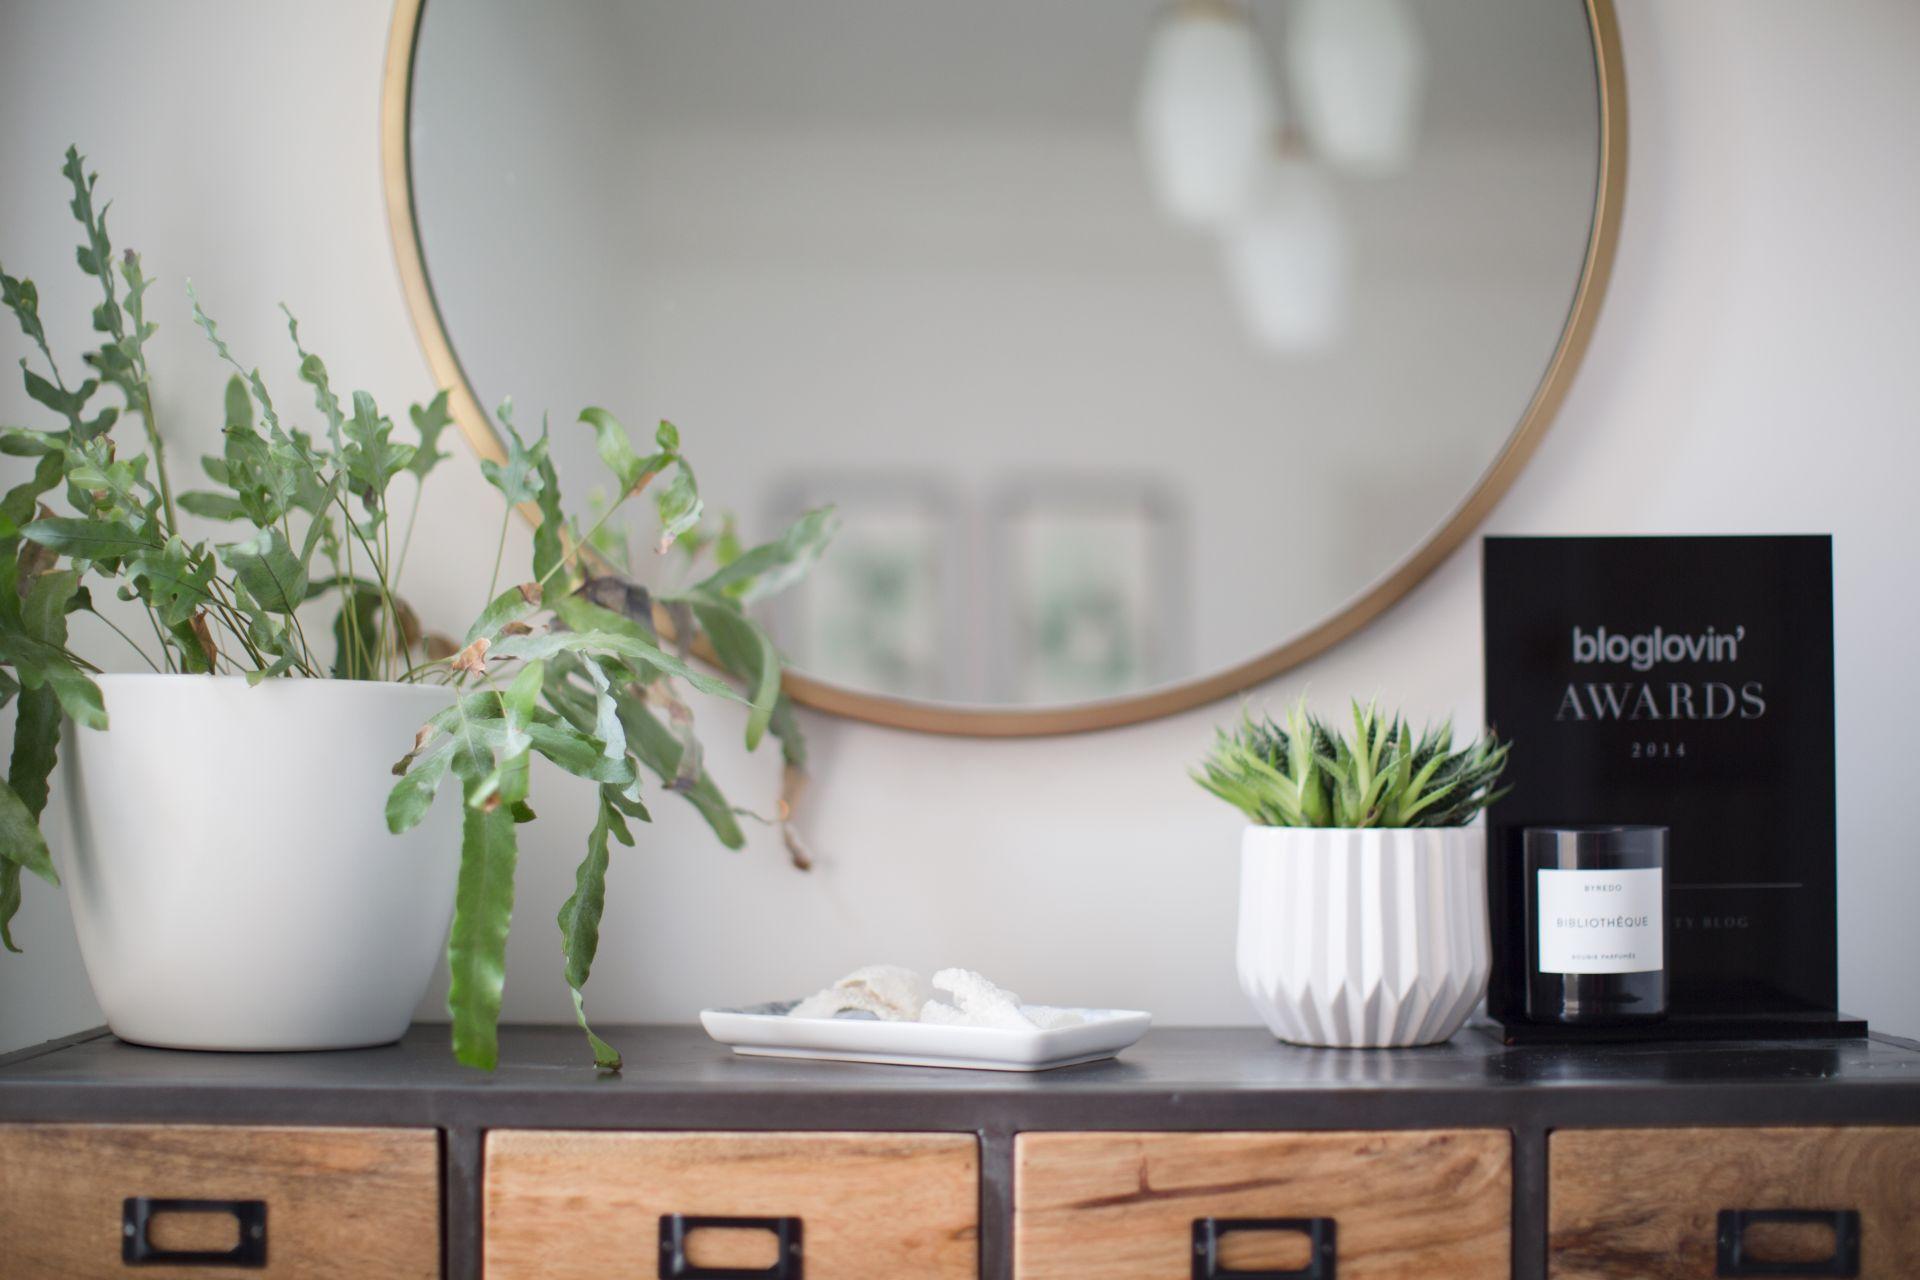 theannaedit-house-tour-home-decor-interiors-west-elm-january-2017-2